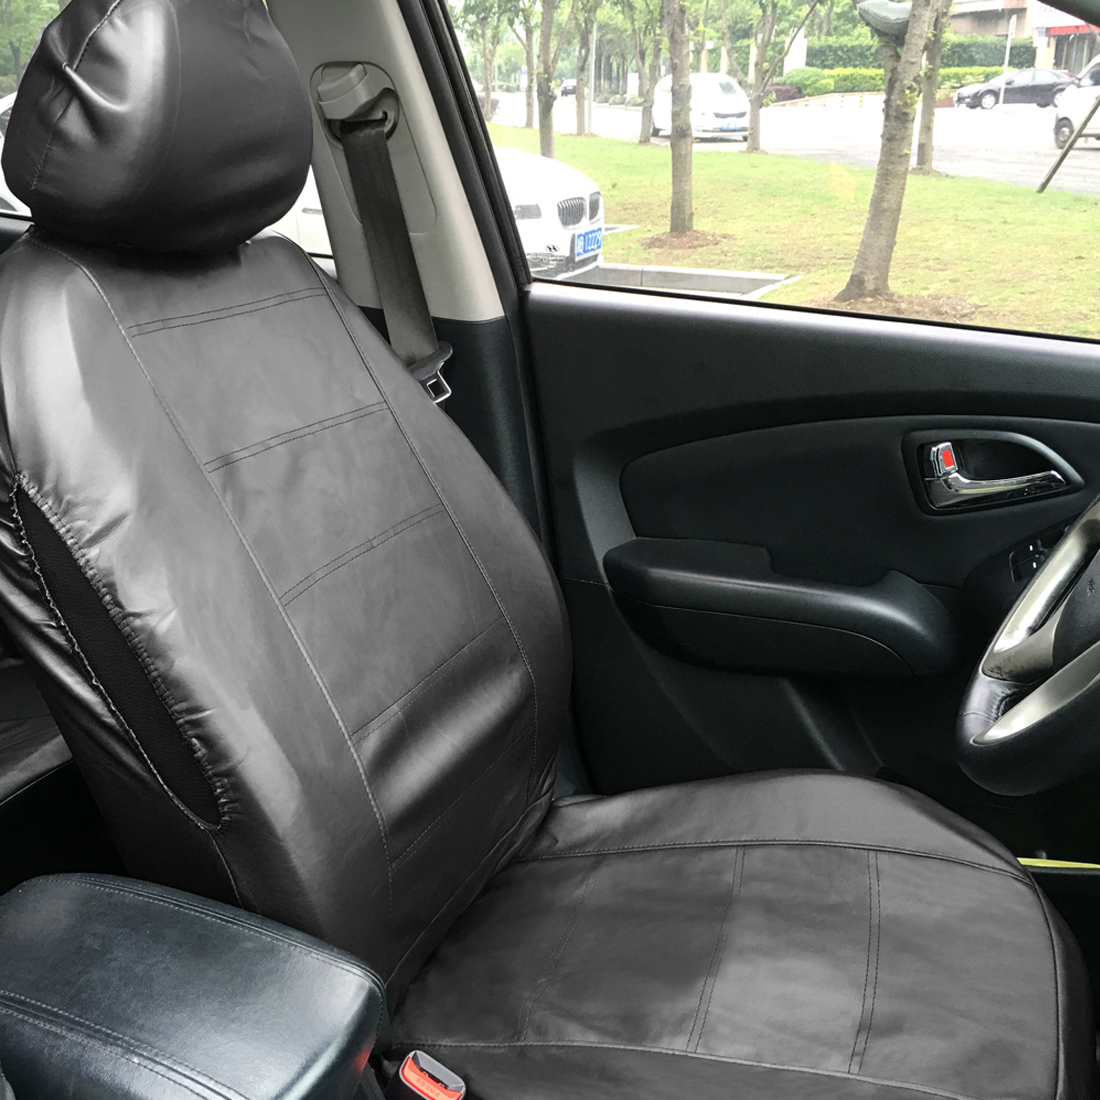 Universal PU Faux Leather Car Seat Cover Full Set 11 Pcs Interior Black